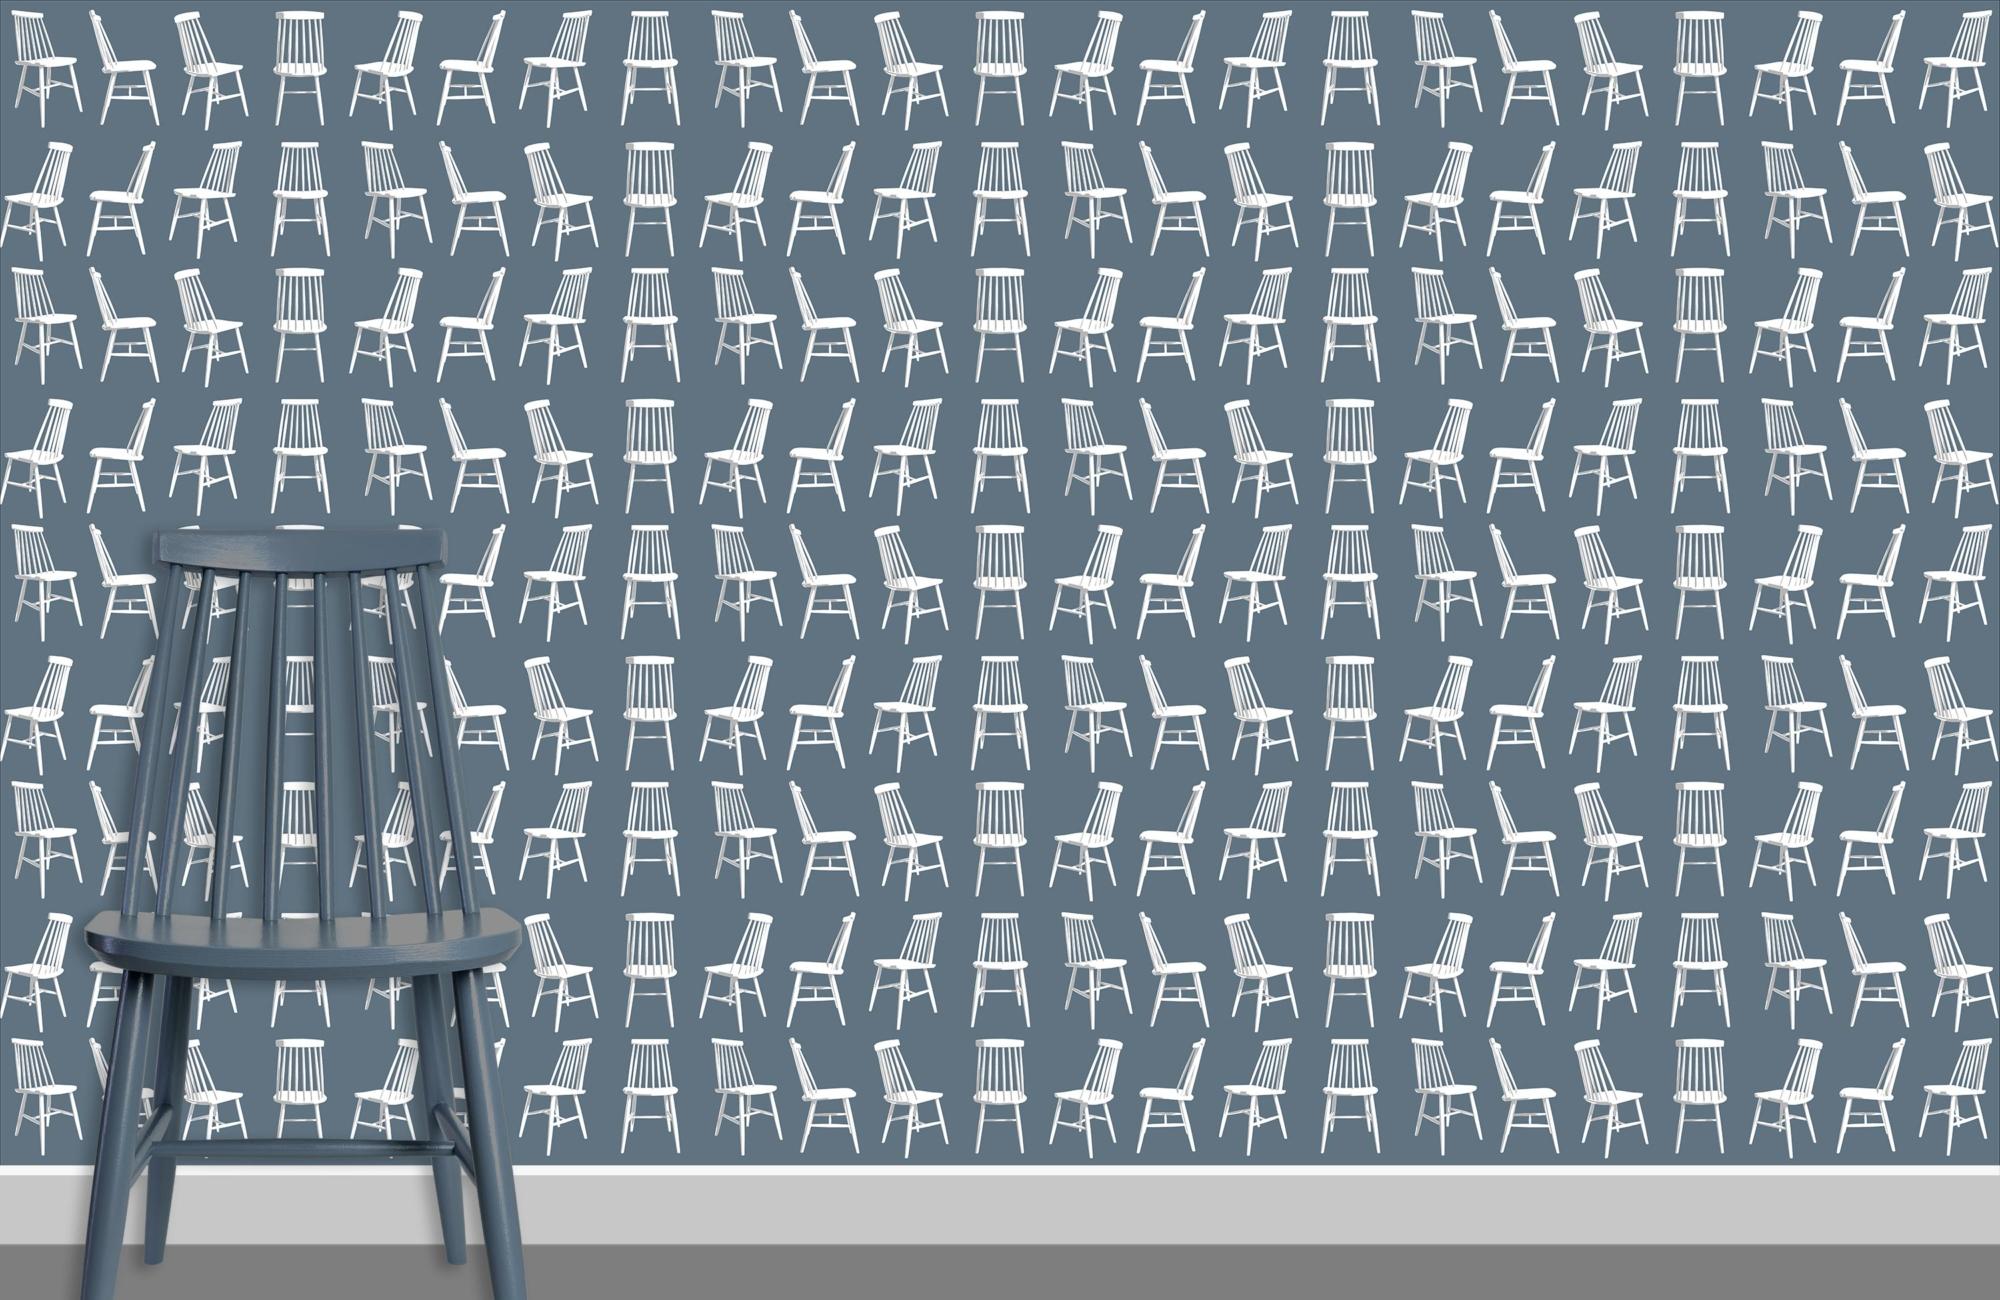 Mid Century Chairs Pattern G 3CD